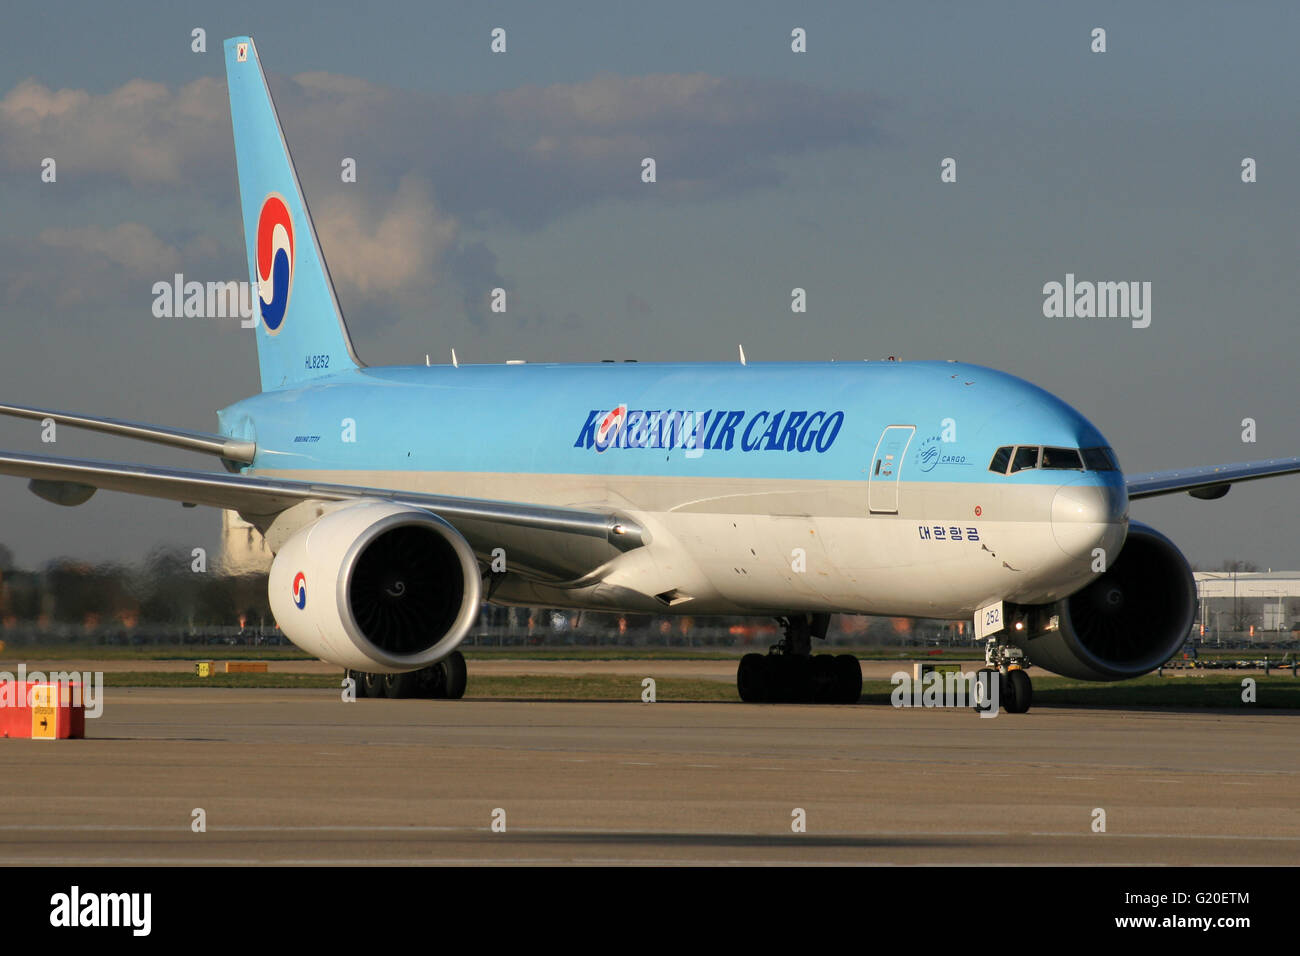 KOREAN AIR CARGO 777 - Stock Image